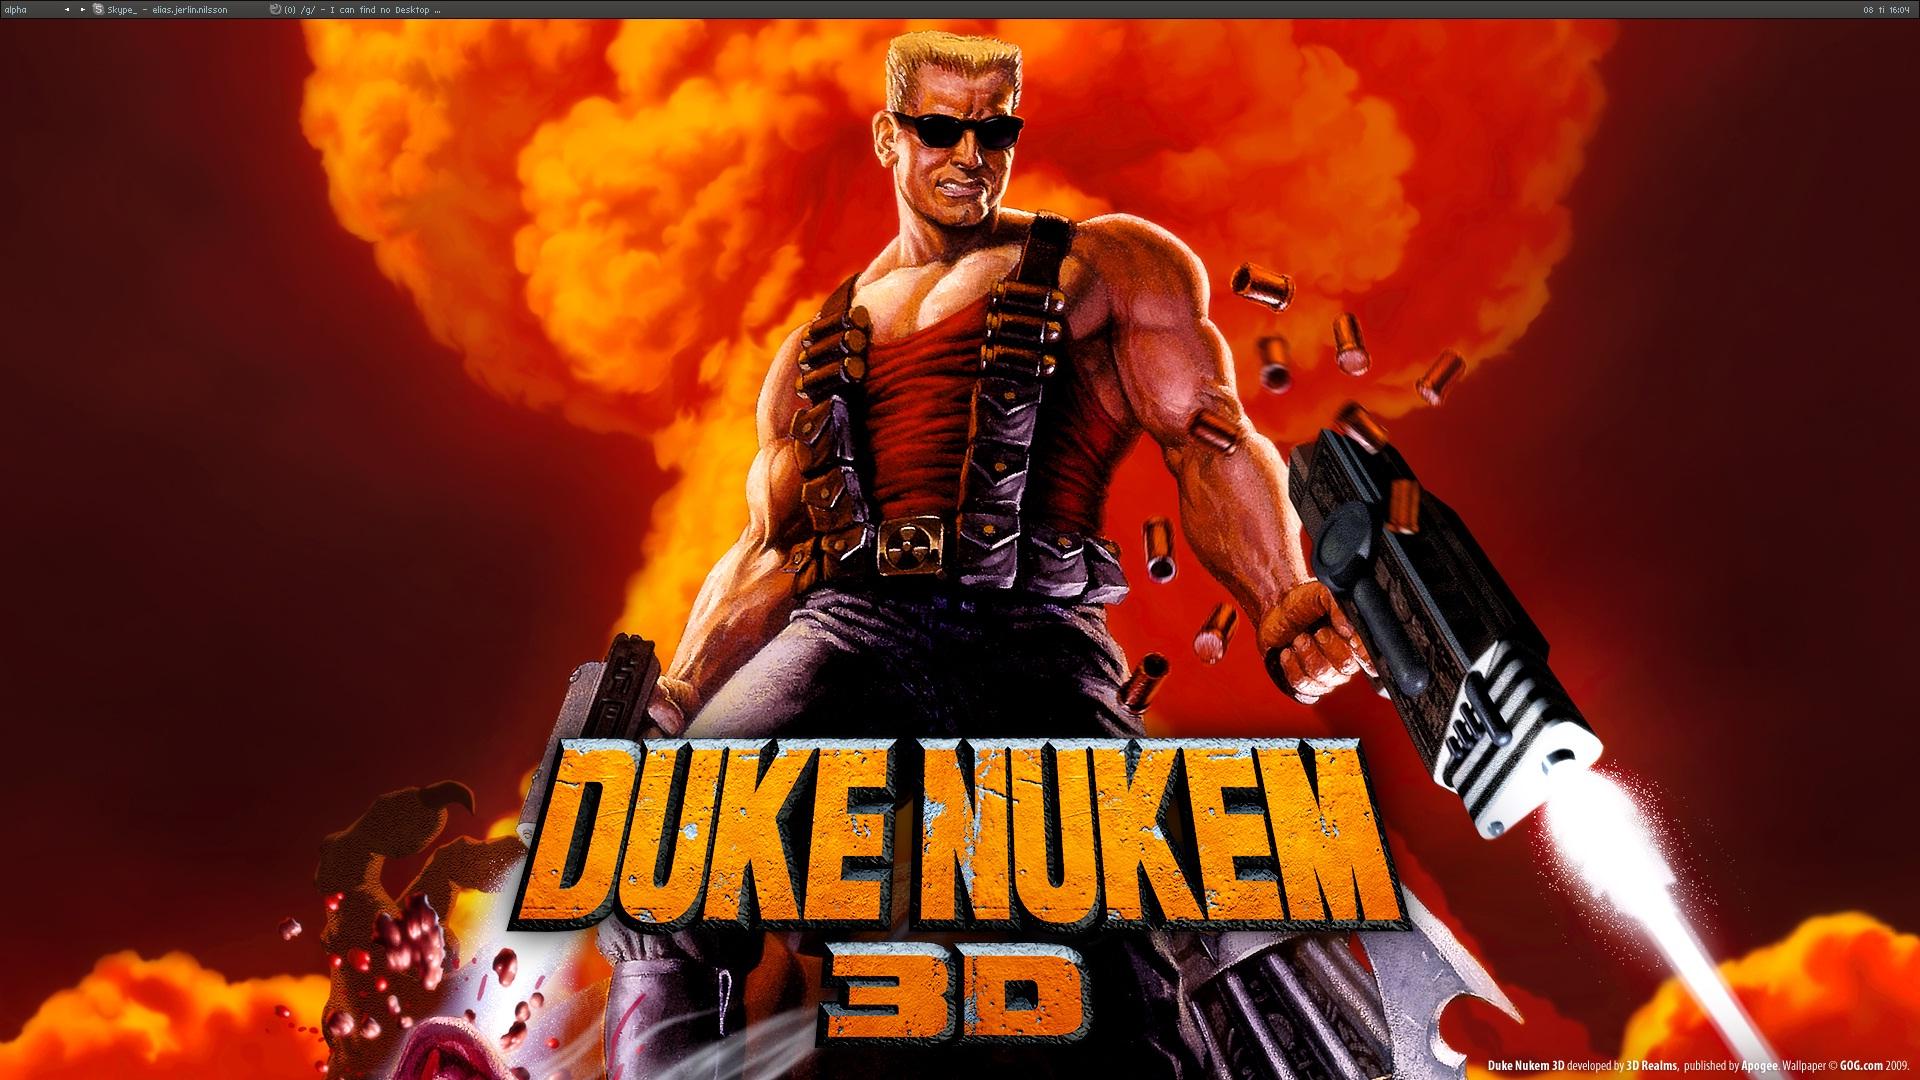 how to change controls on duke nukem 3d